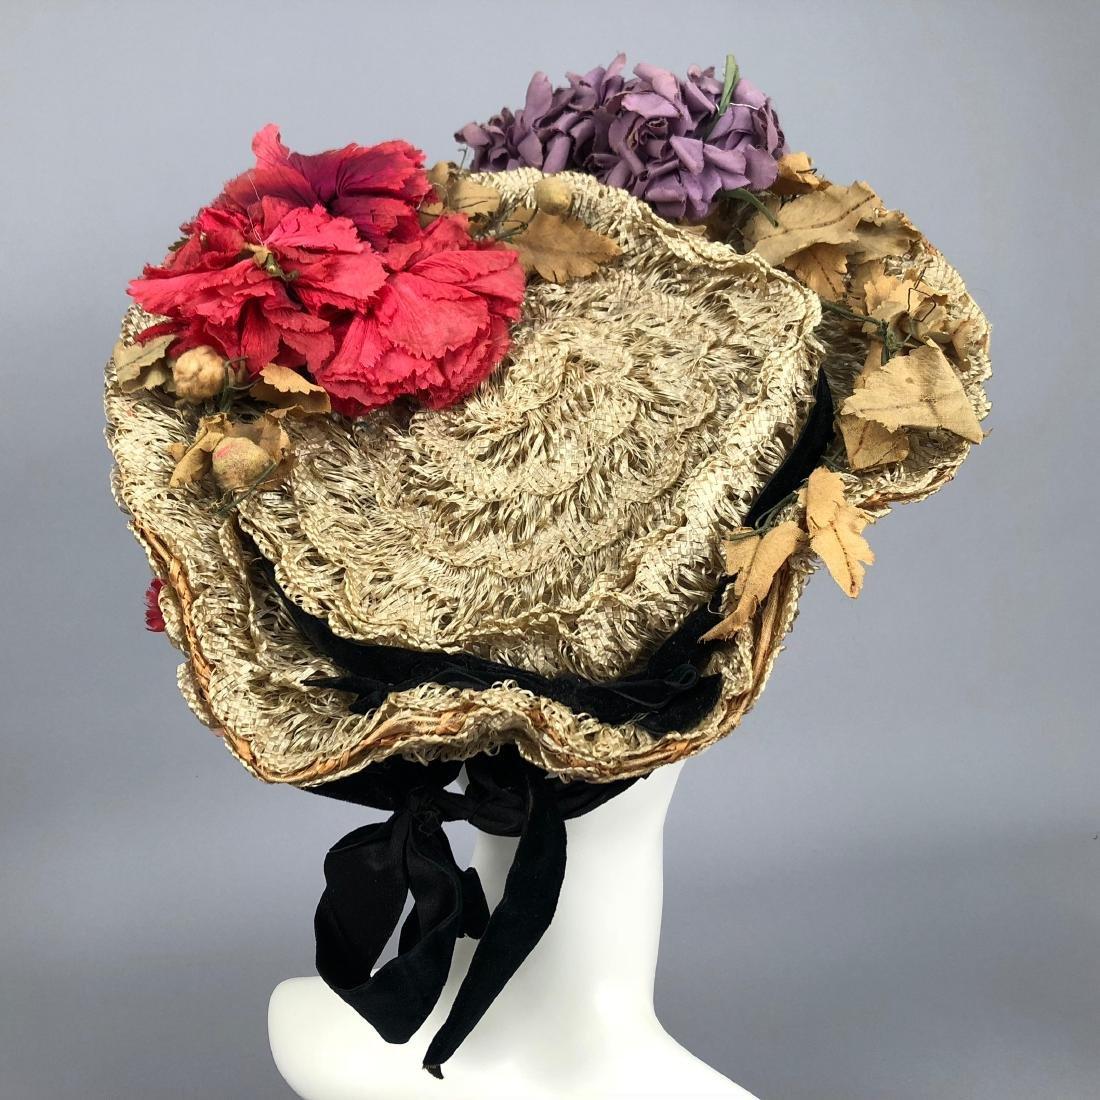 THREE WIRED HIGH-BRIM HATS, 1890s - 5